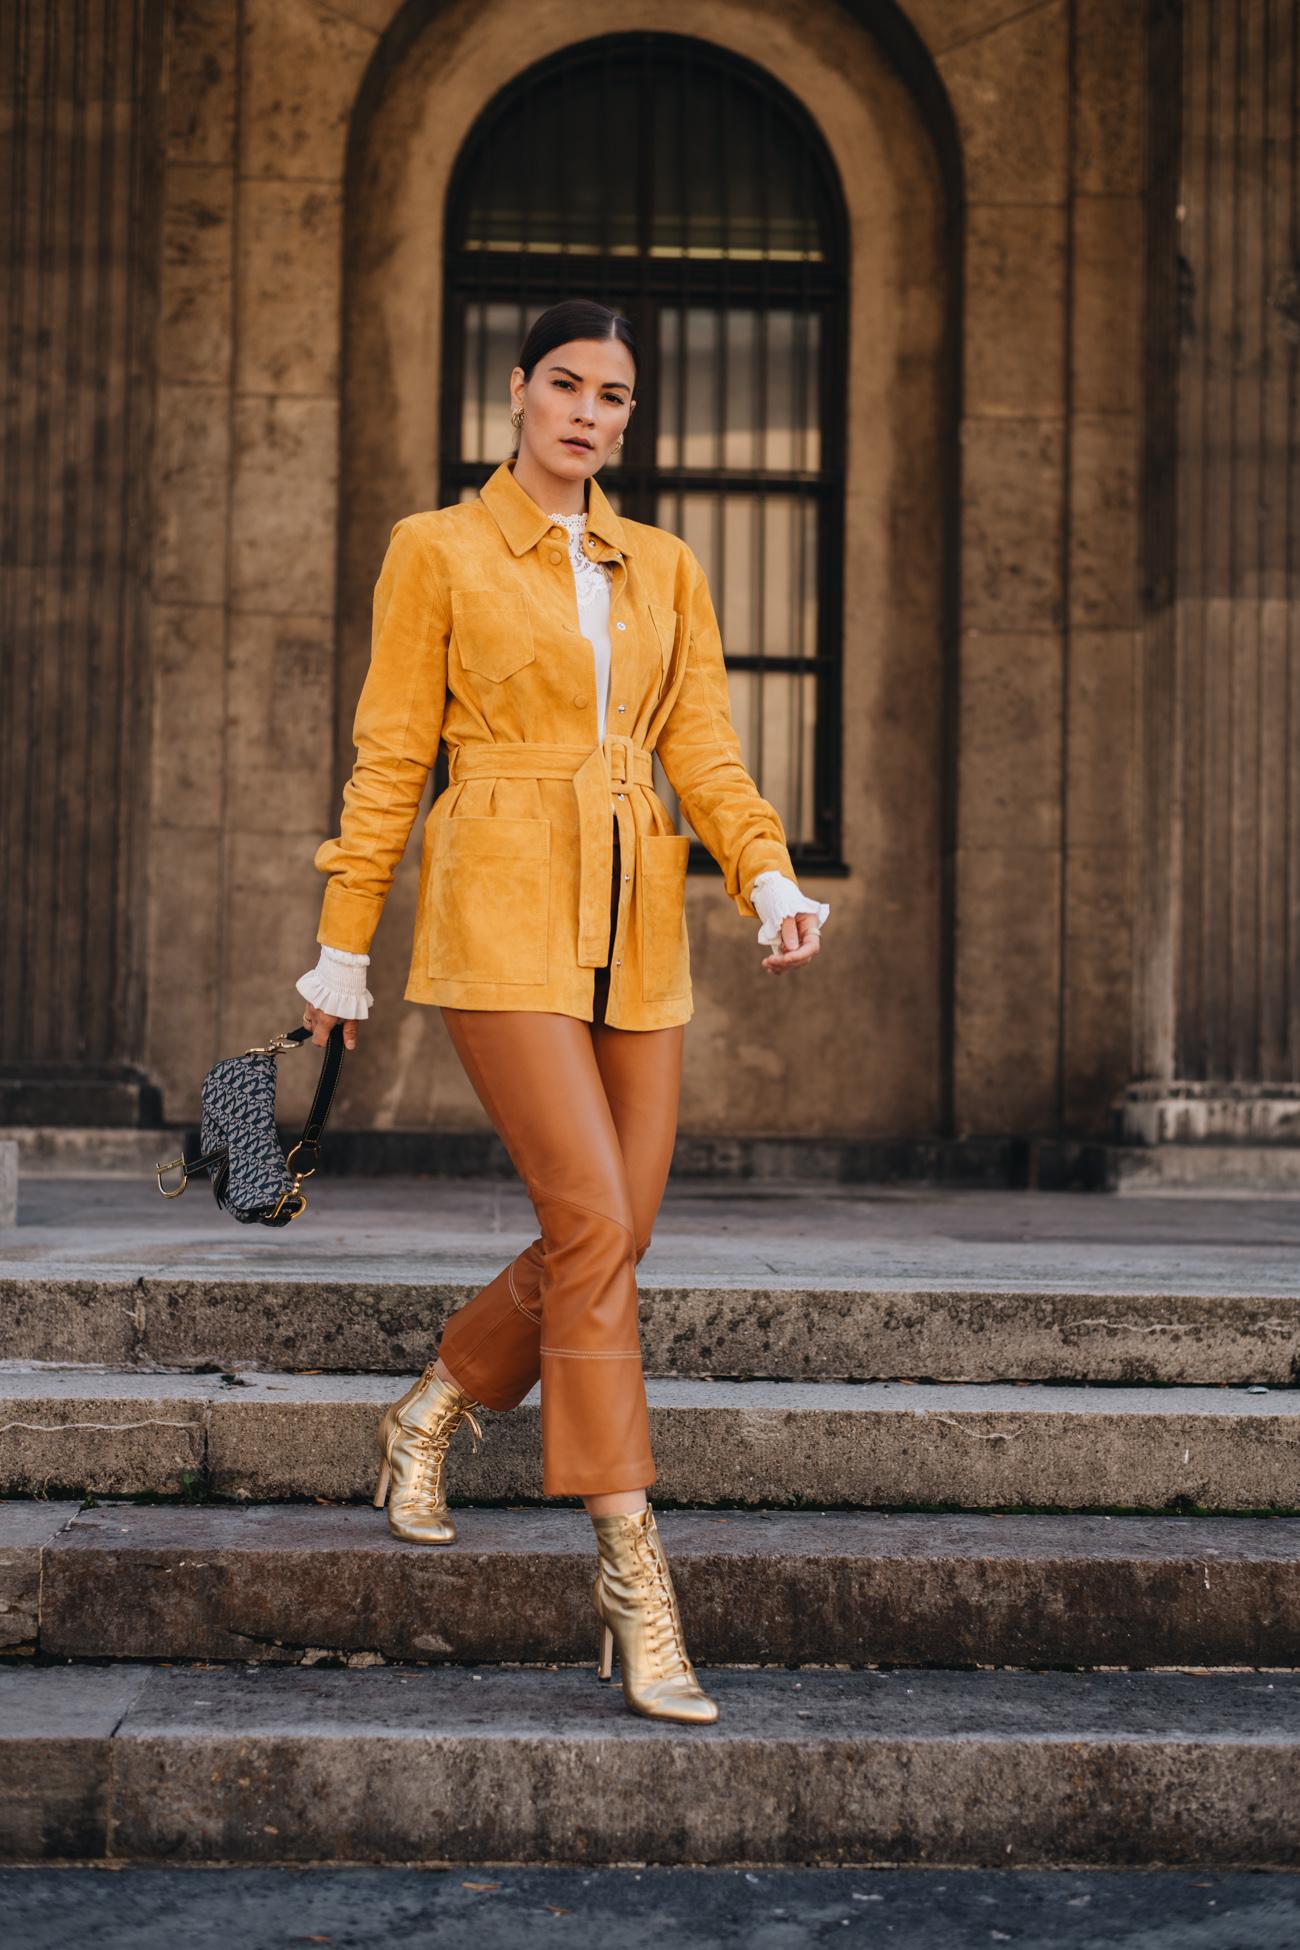 Herbst Outfit mit Lederhose